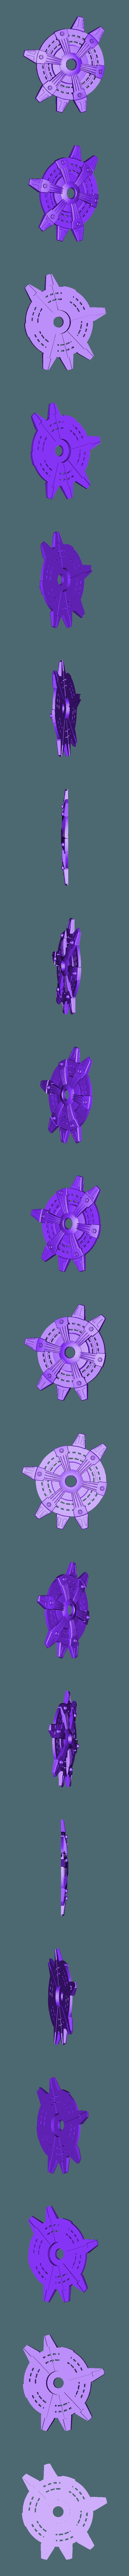 main_body.stl Download free STL file Firestorm Quantum Splicer • 3D printable design, poblocki1982